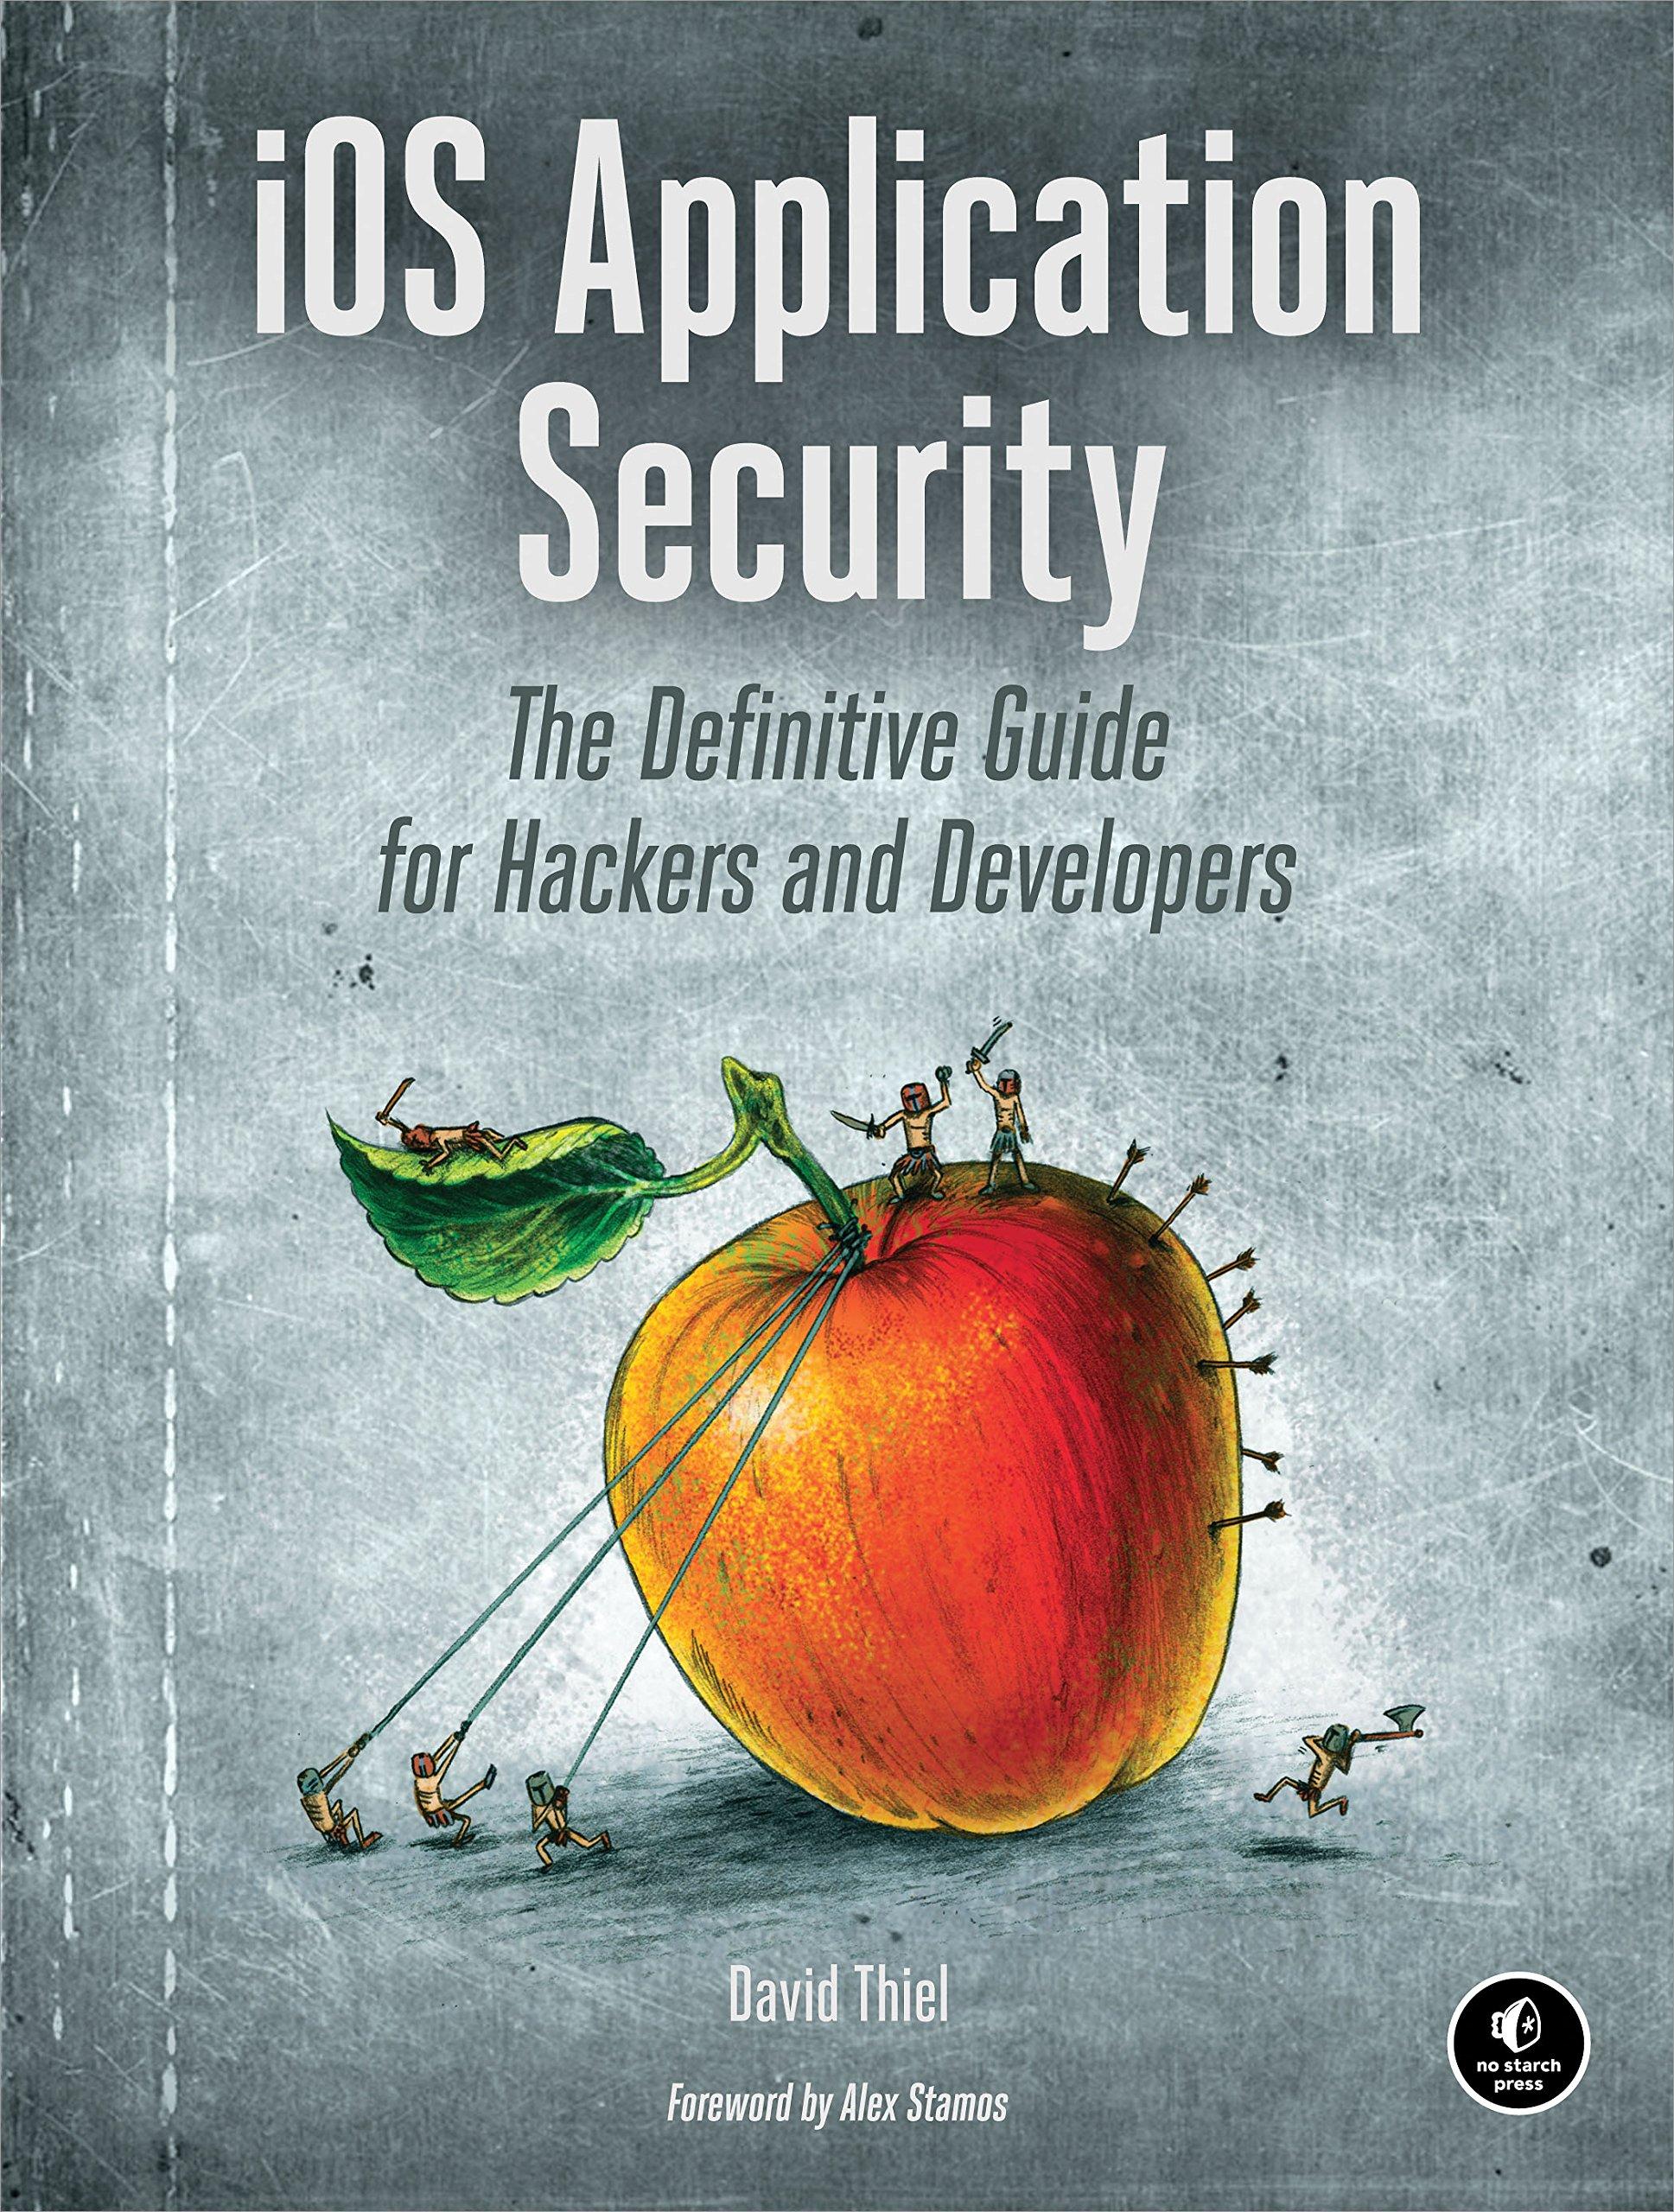 iOS Application Security ISBN-13 9781593276010